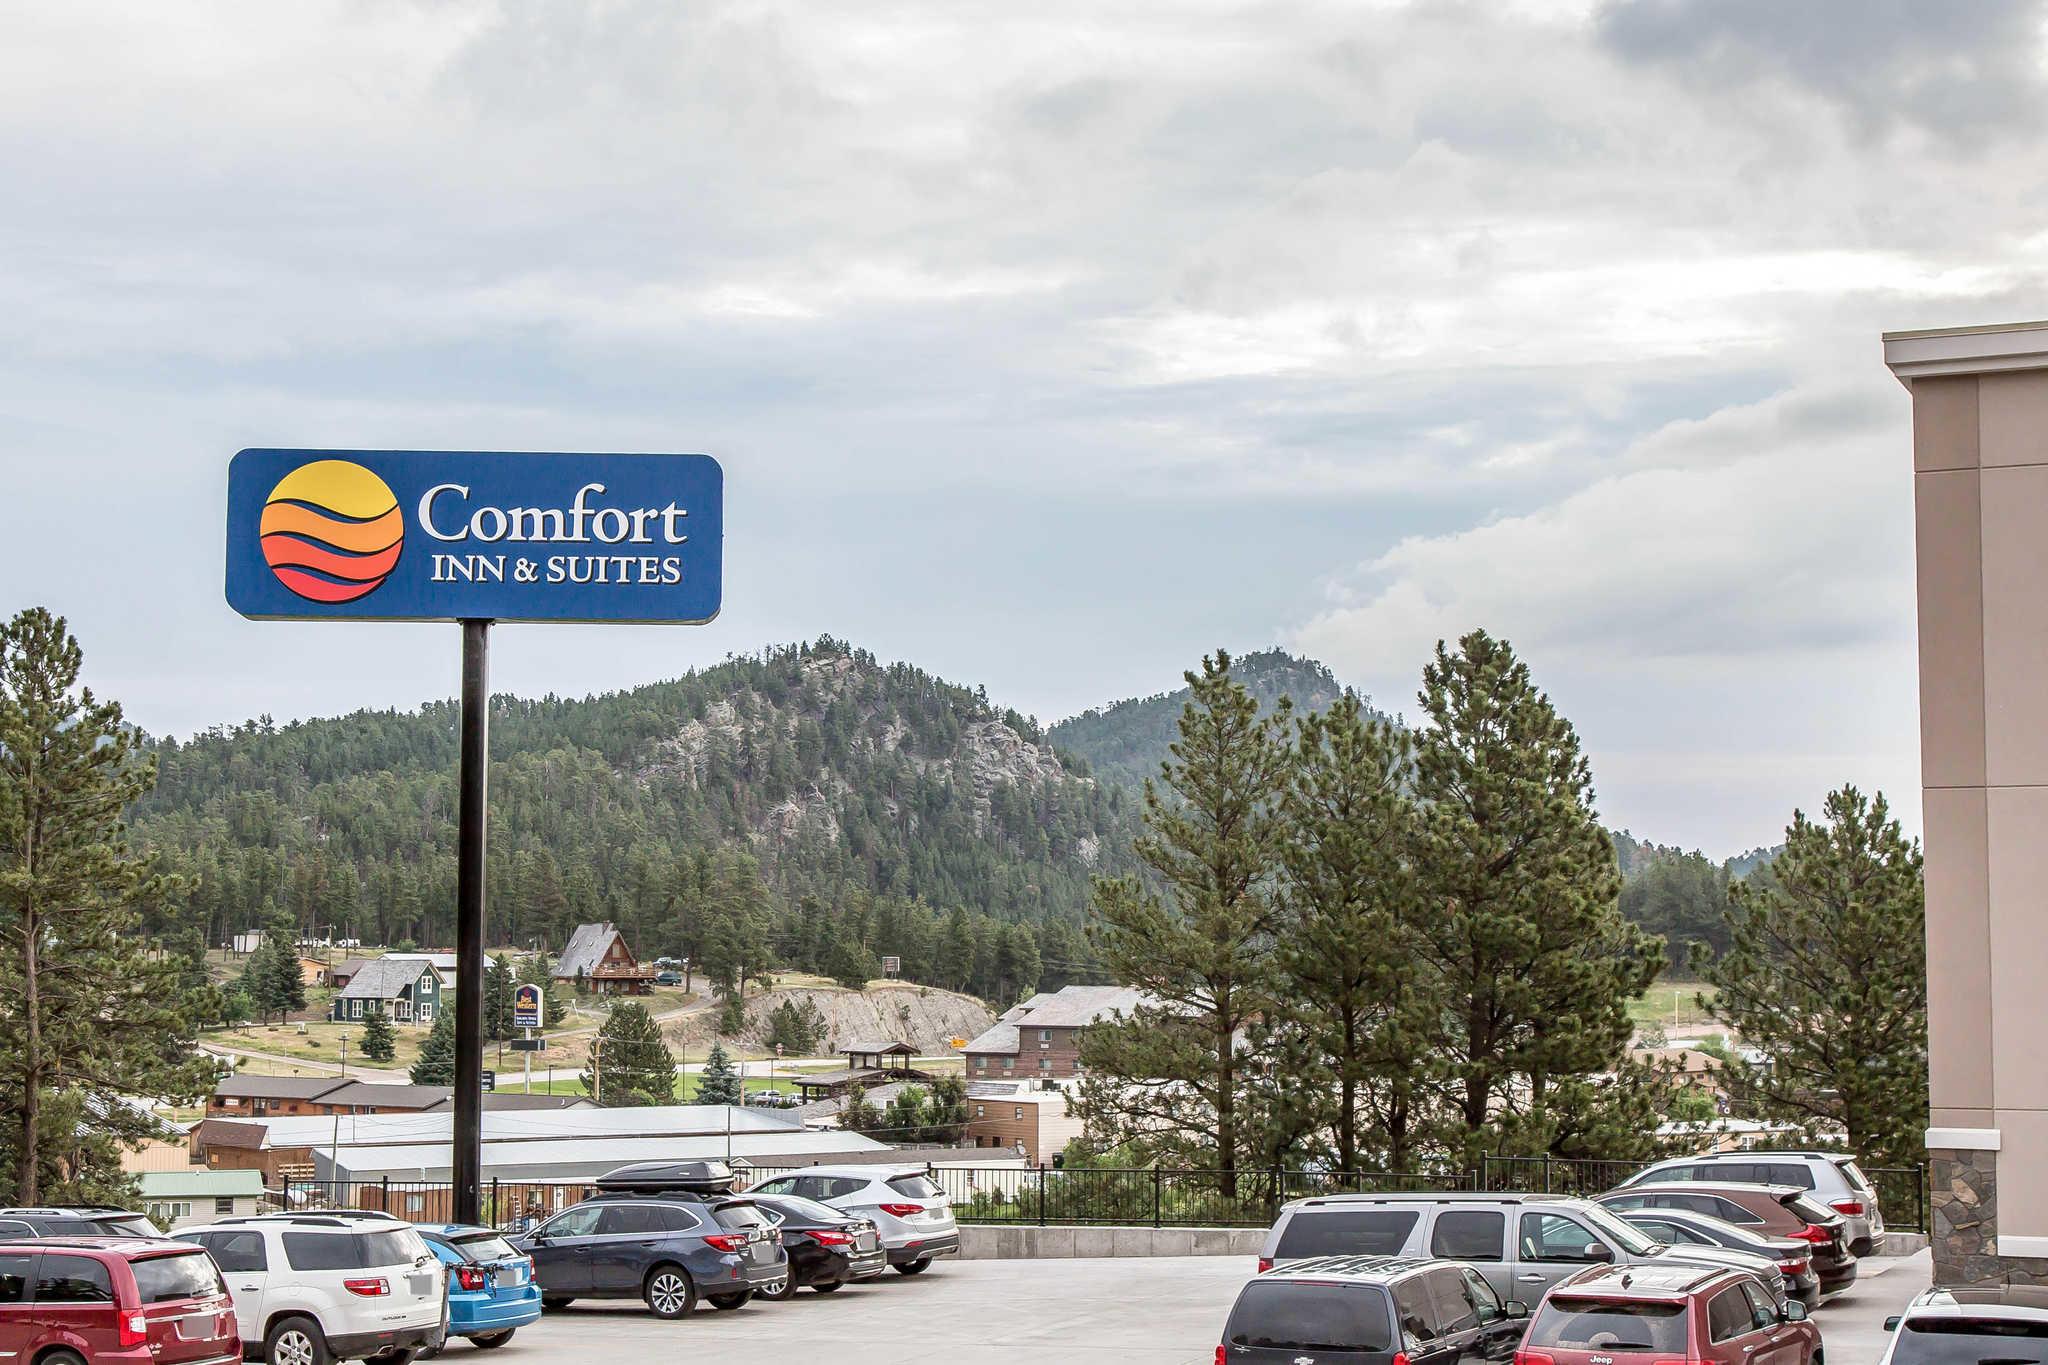 Comfort Inn & Suites Near Mt. Rushmore image 3